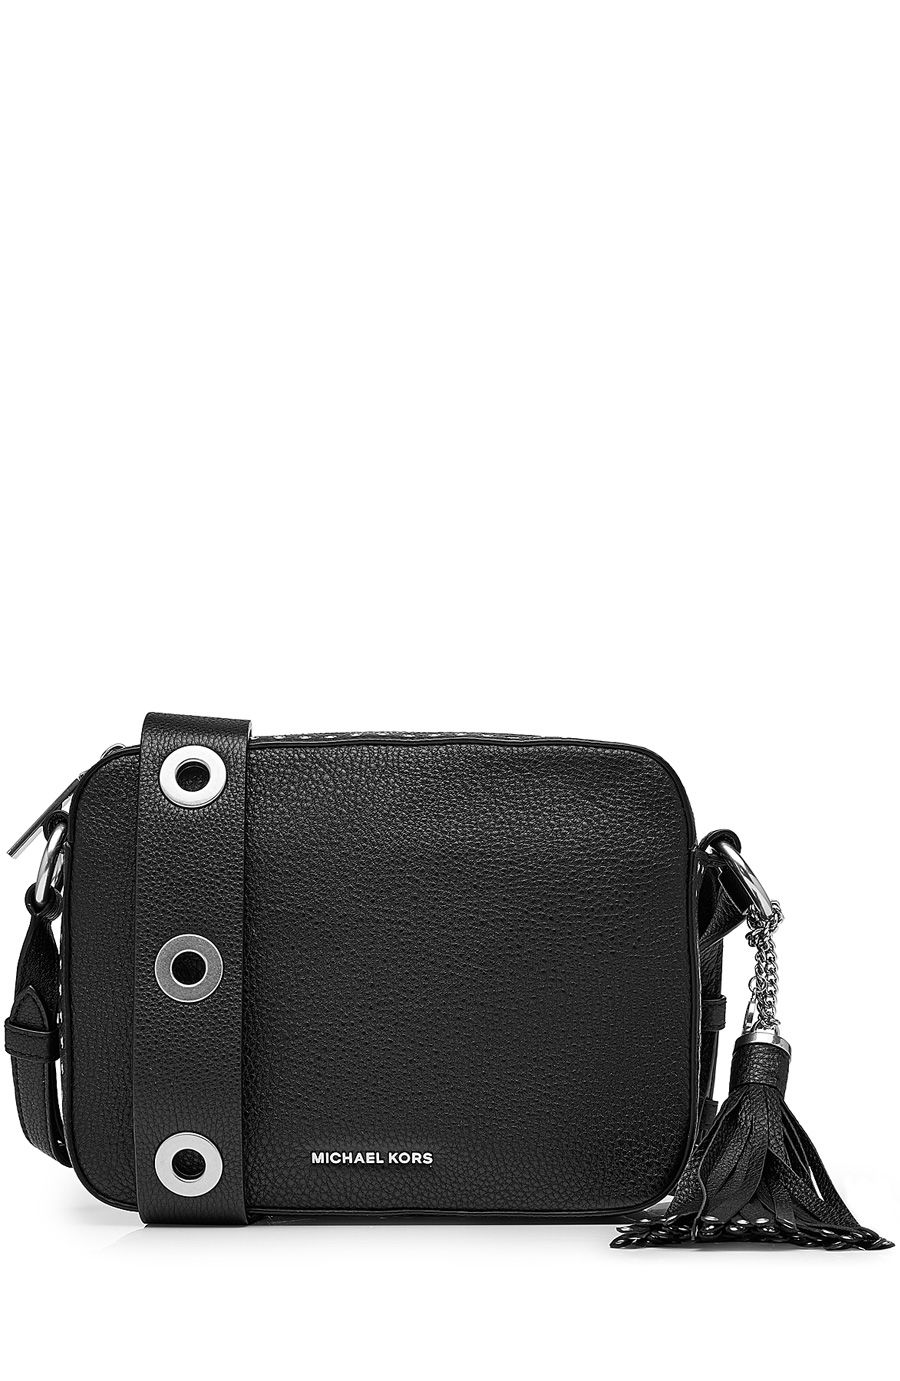 4ac660ca92 MICHAEL MICHAEL KORS Brooklyn Large Leather Camera Bag.  michaelmichaelkors   bags  shoulder bags  leather  lining